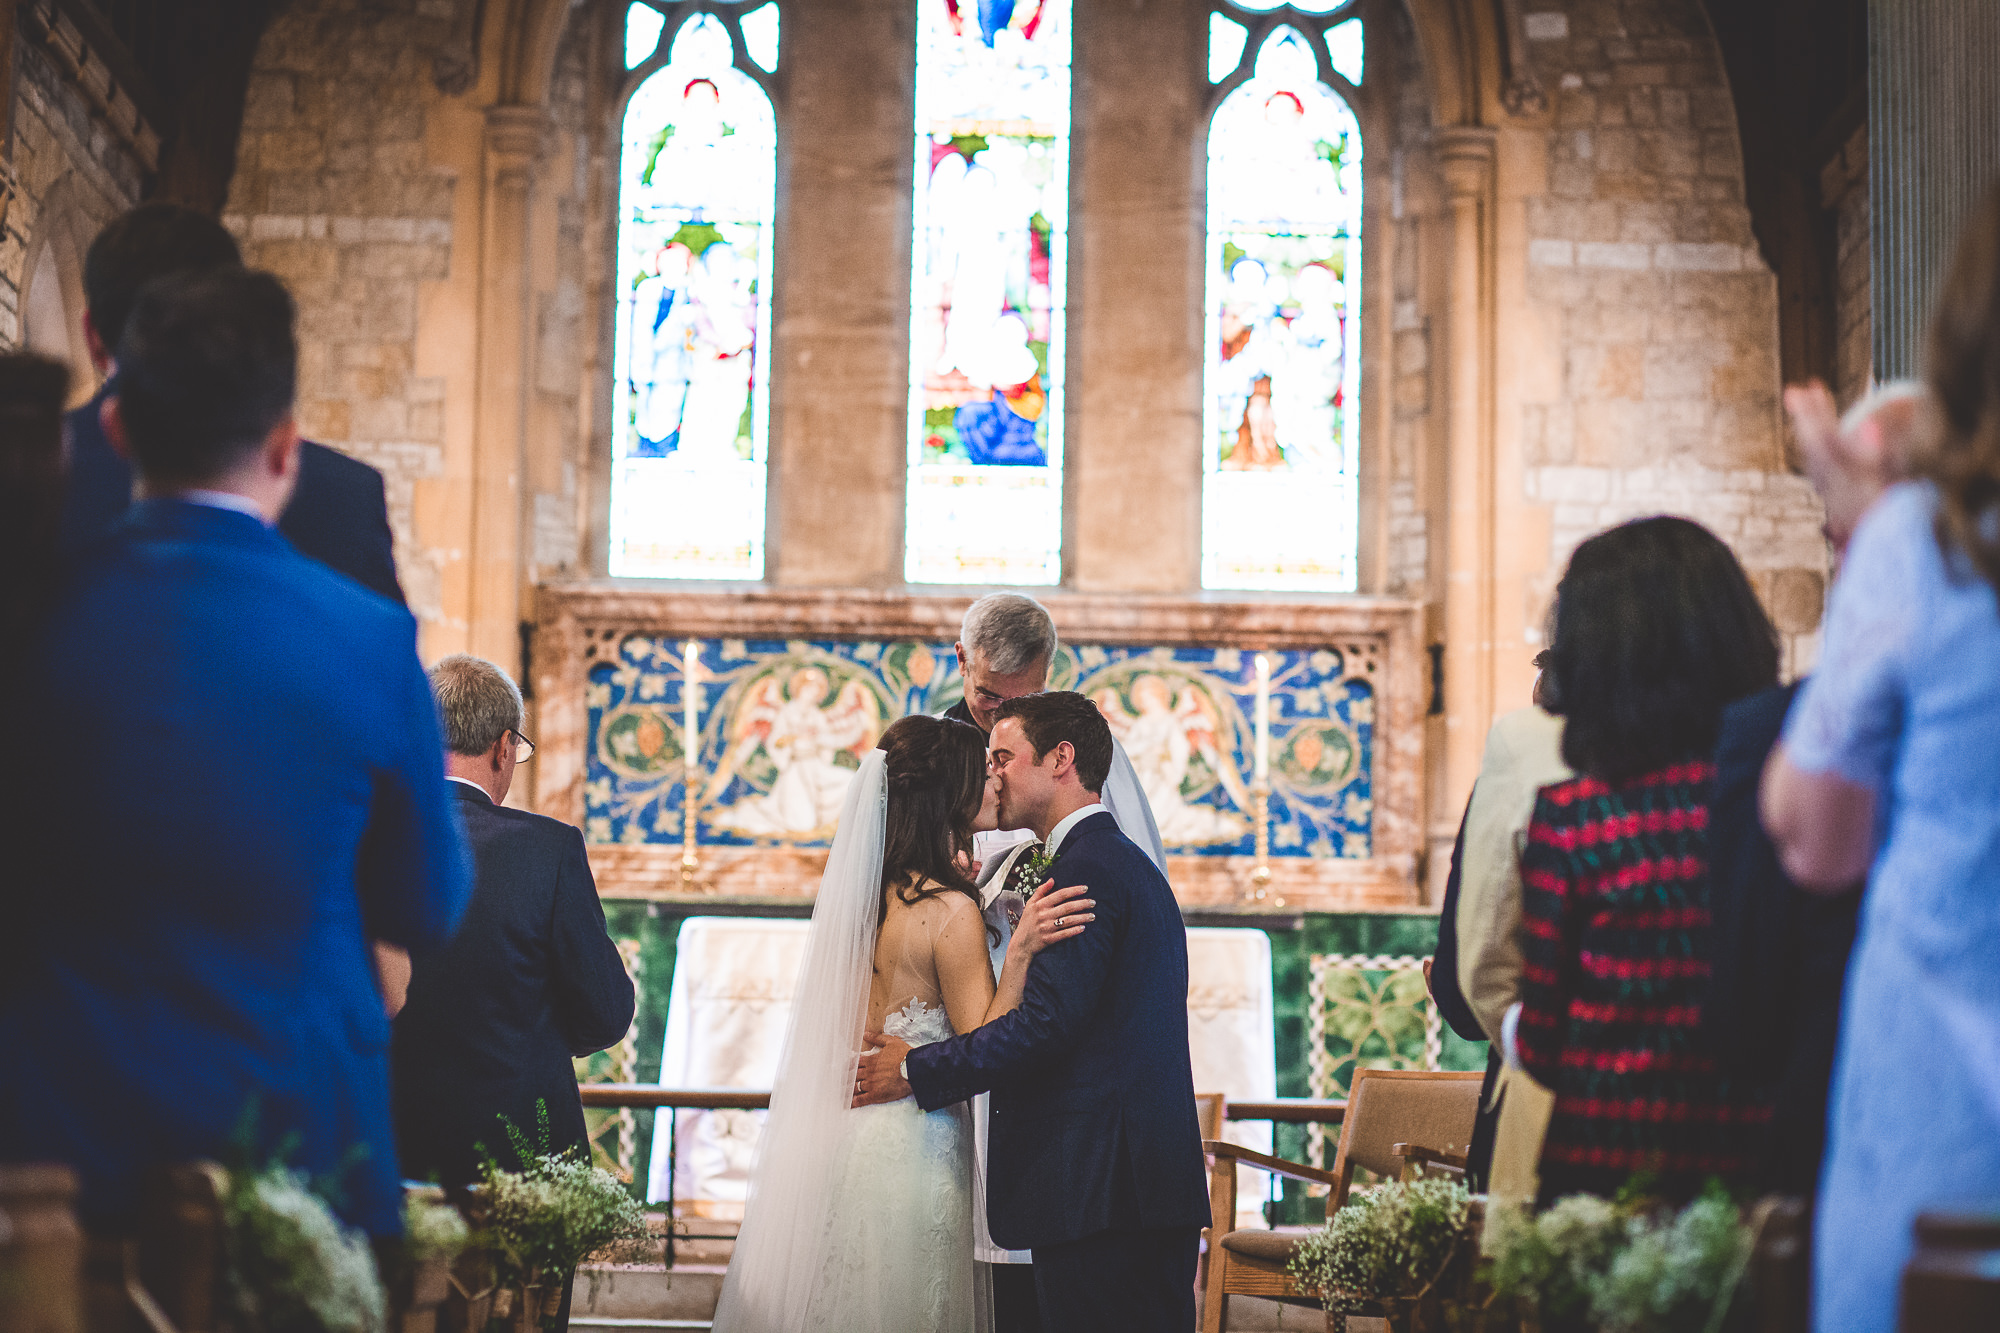 Veils & Bales Wedding Photography | Charlie & Steve SCSS 077